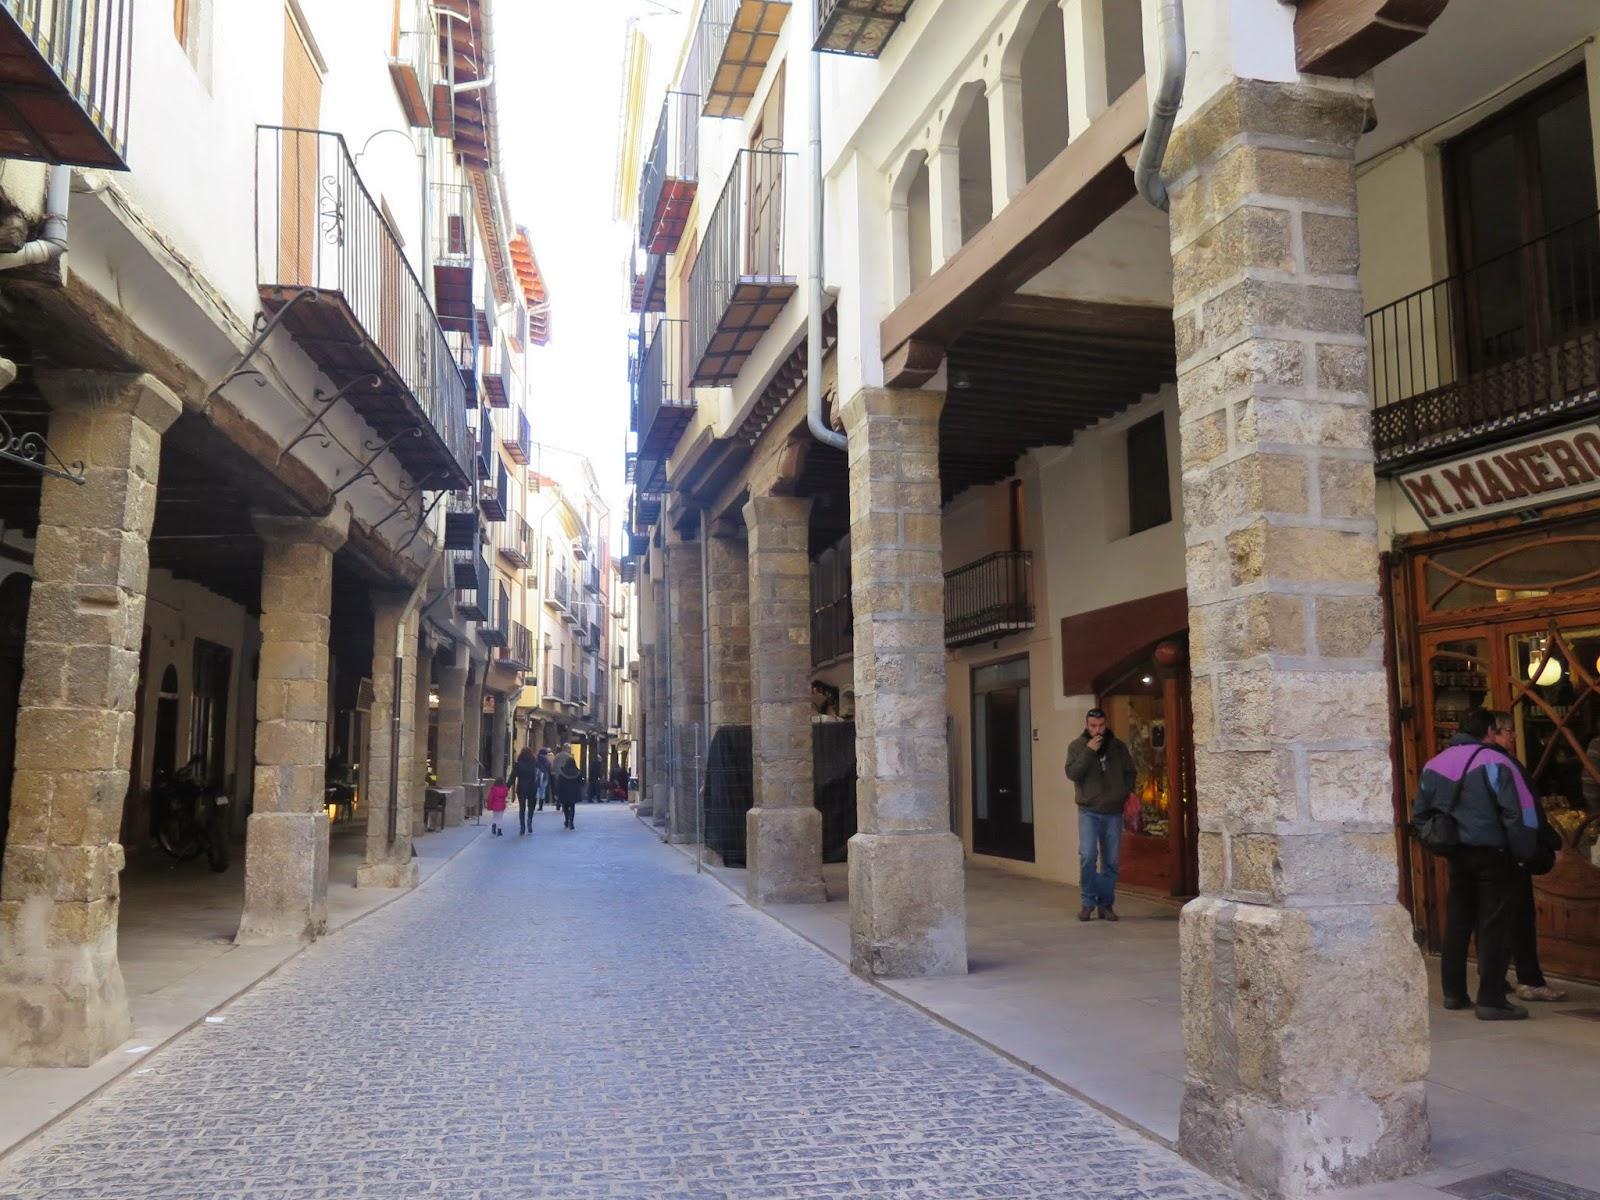 Morella calle principal